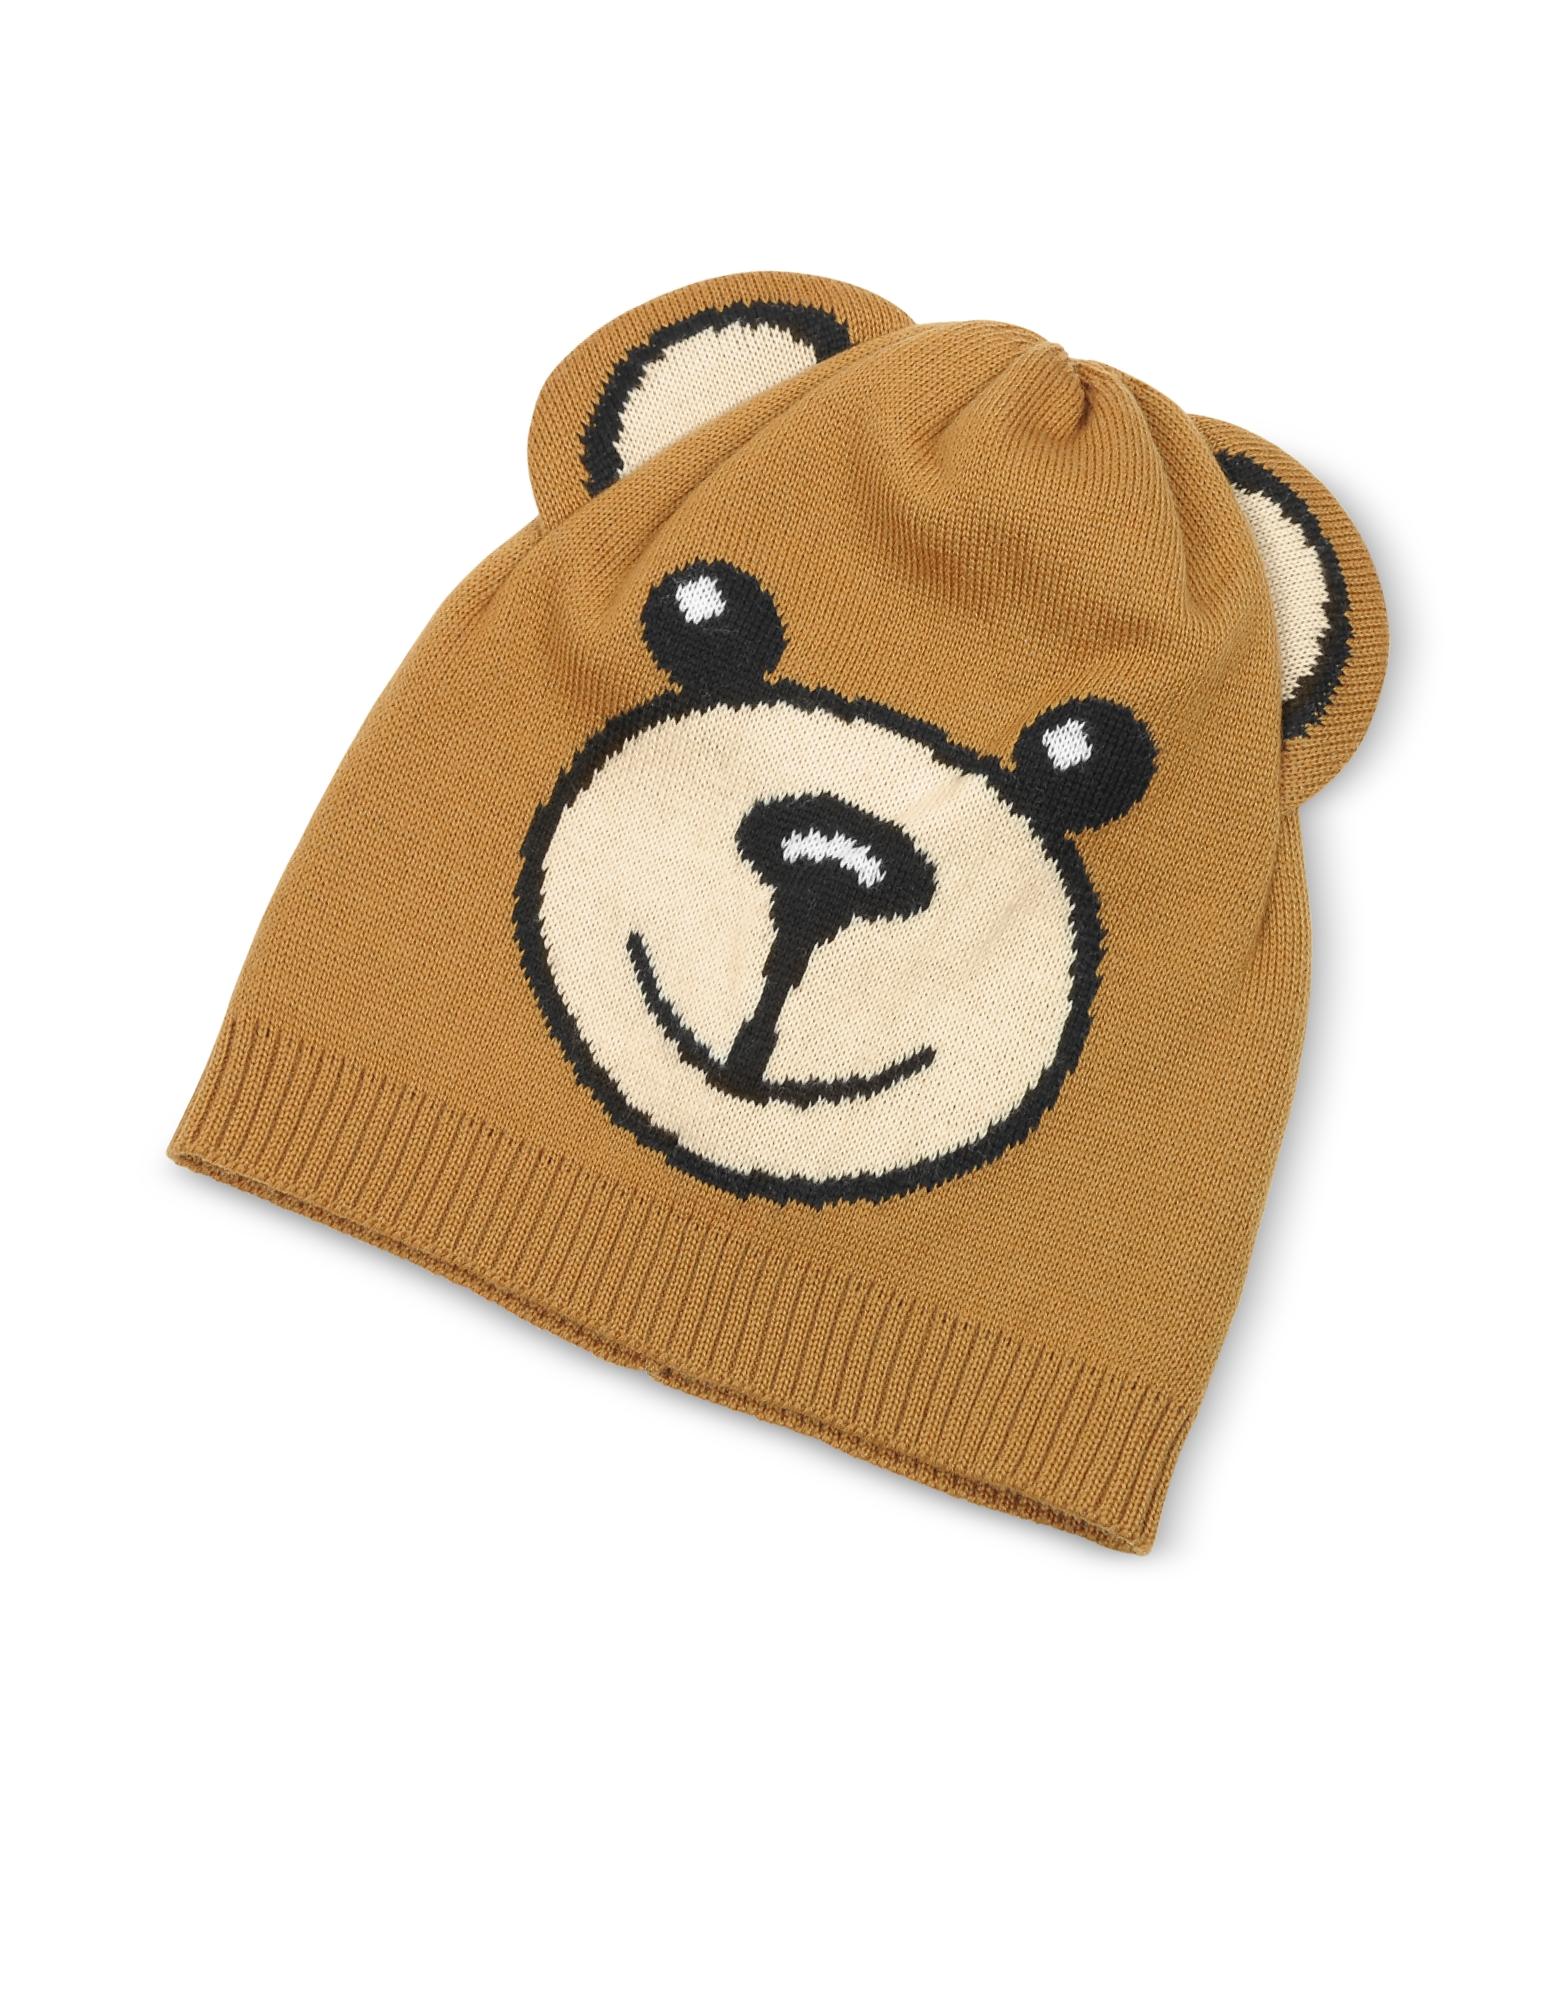 Moschino Teddy Bear Ears Beanie